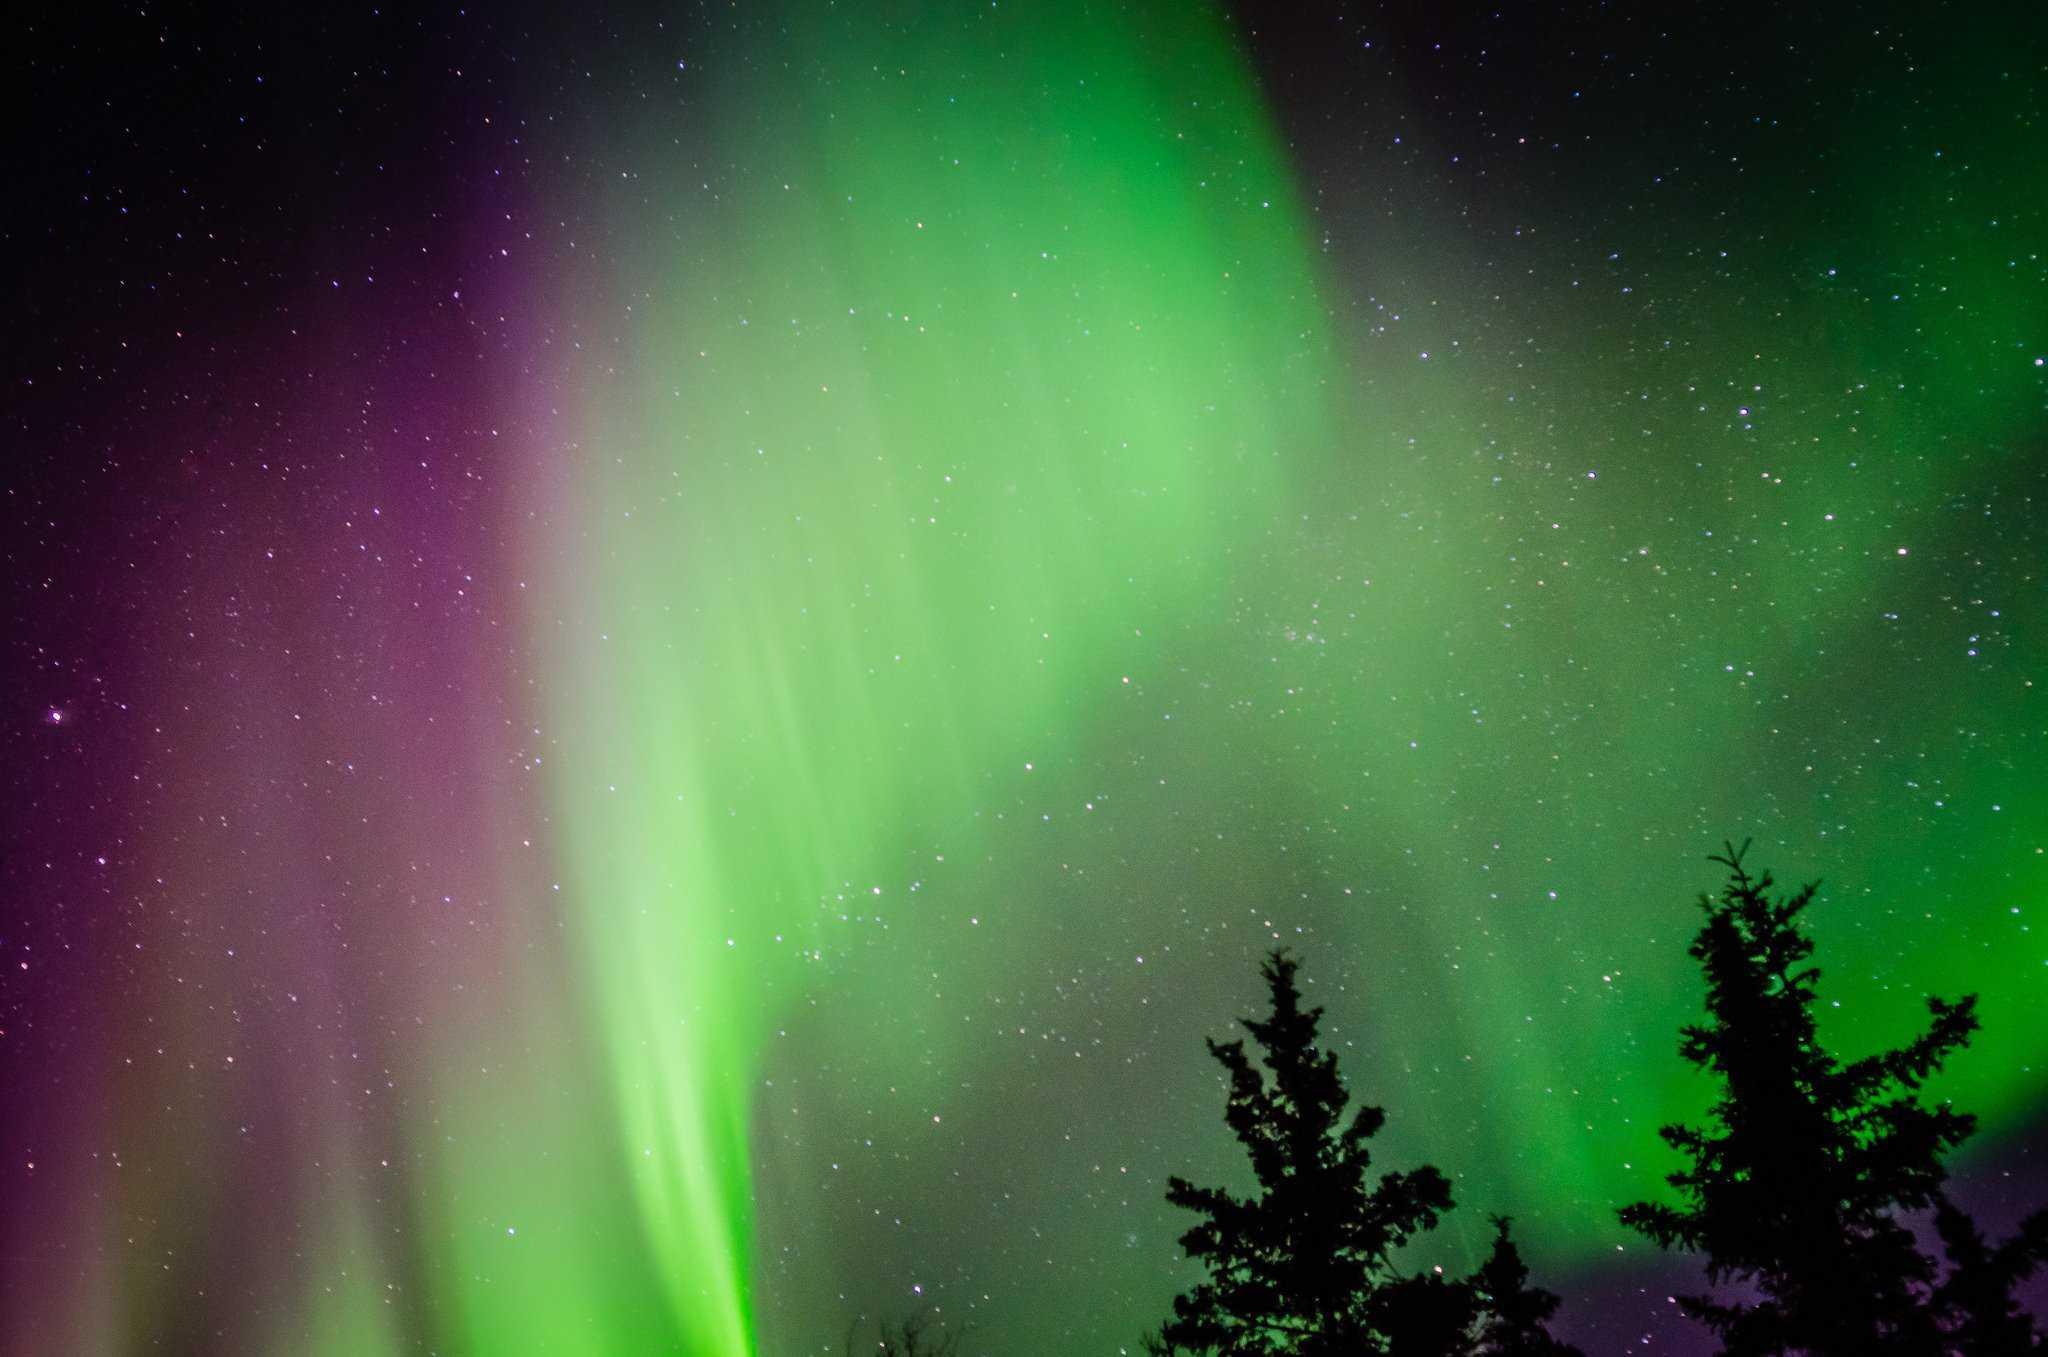 Northern Lights in Alaska - Fairbanks - Aaron Hockley via Flickr